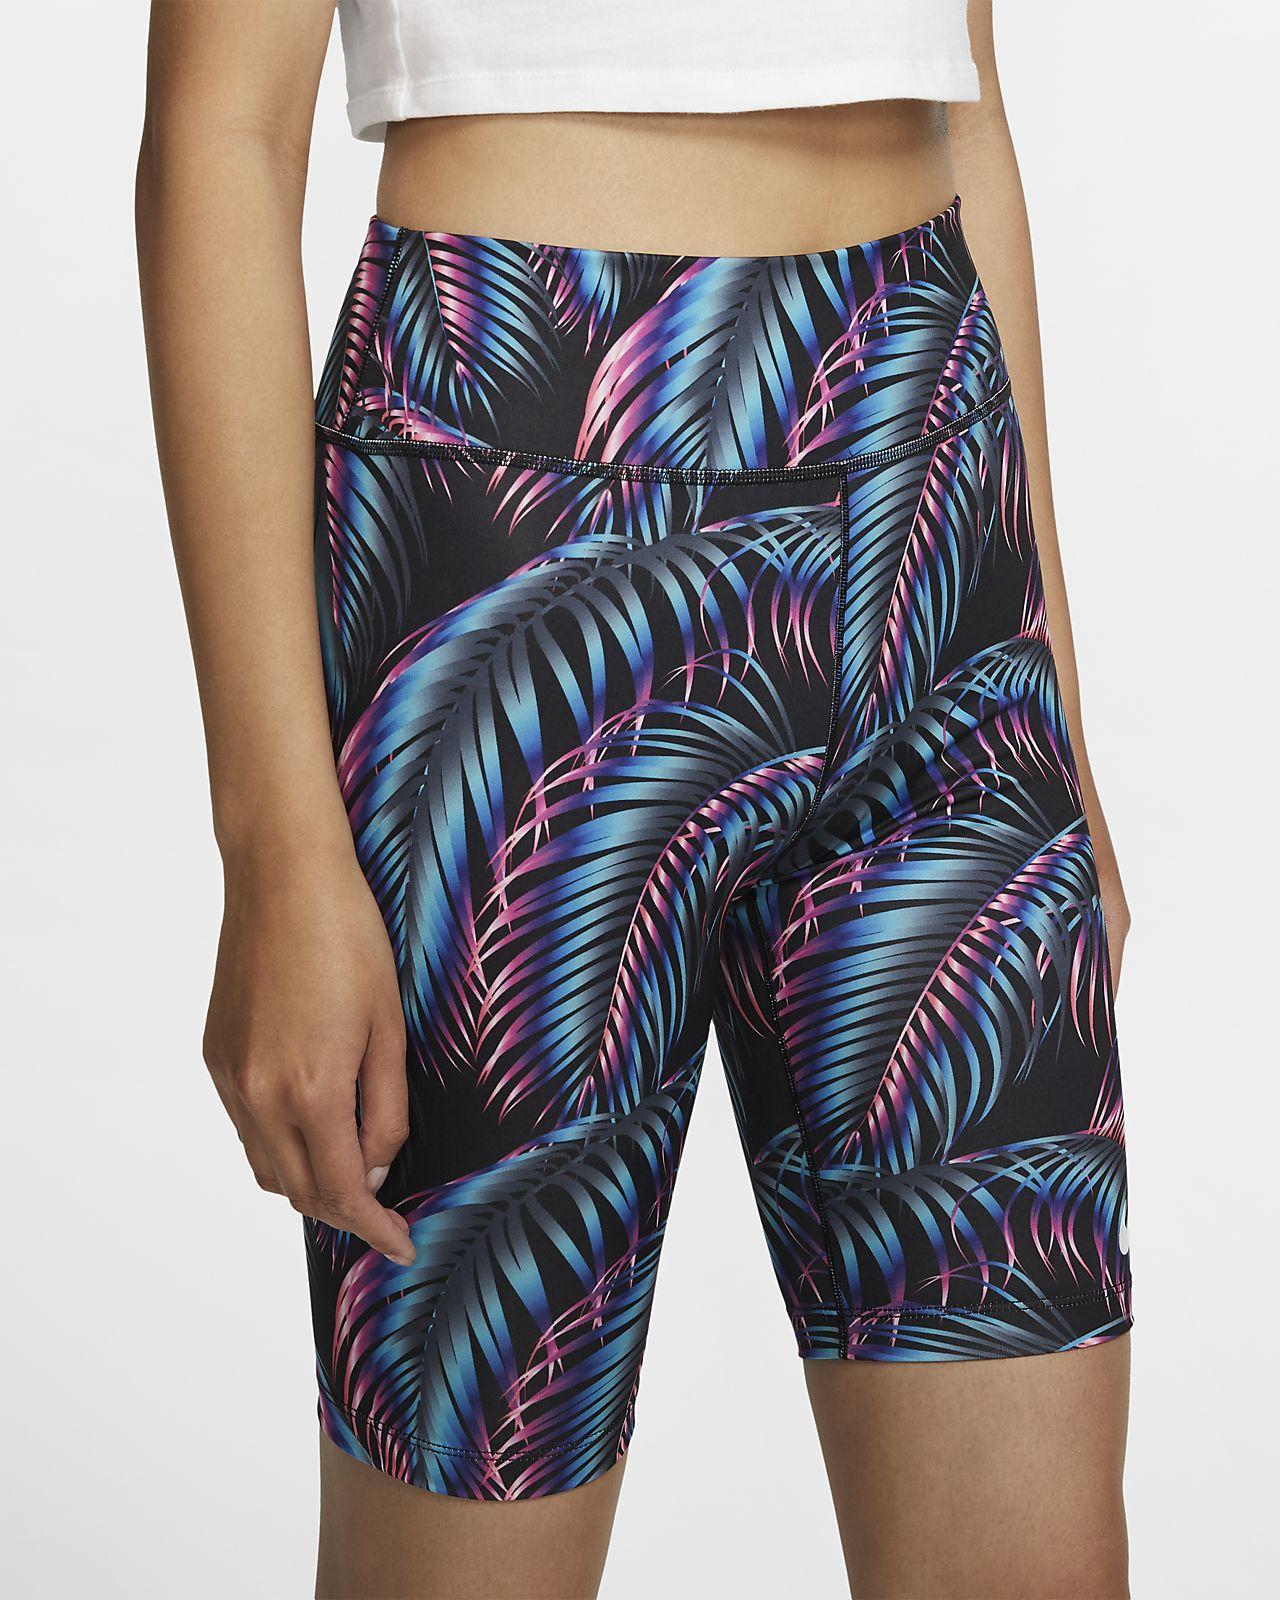 Nike Damen-Radshorts mit Print